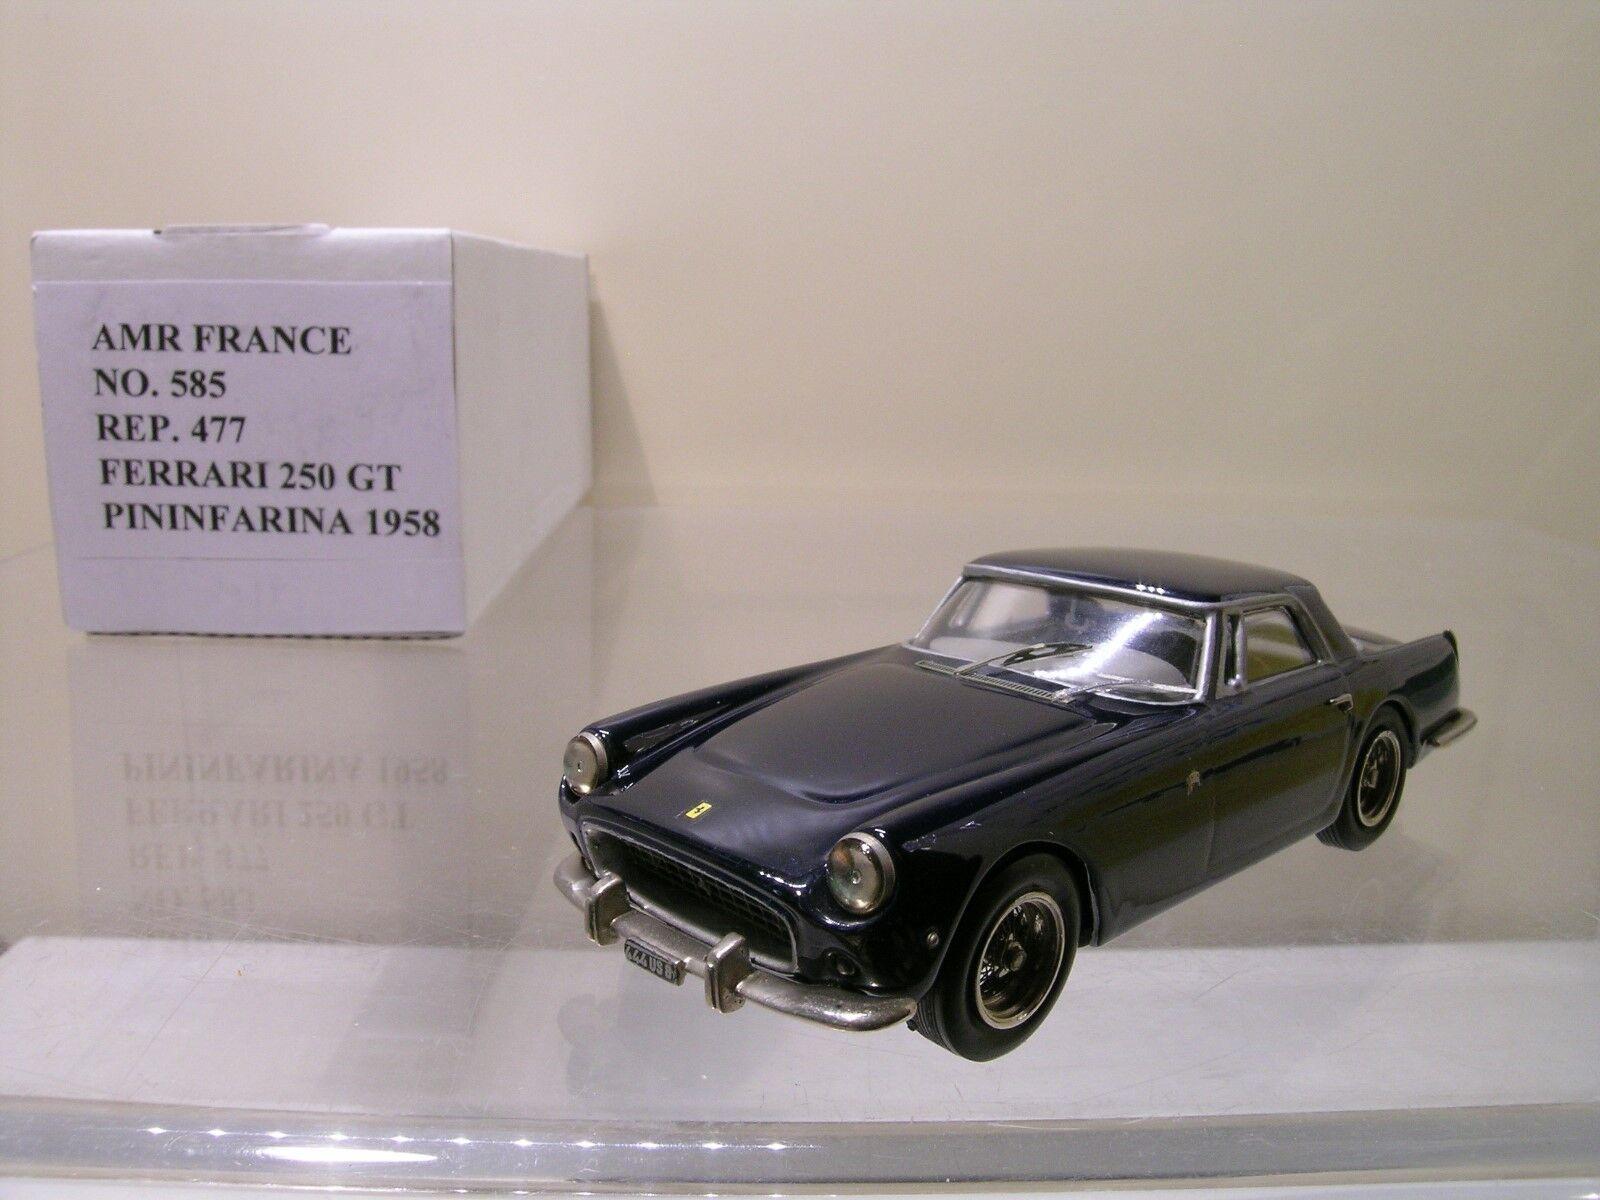 AMR FRANCE 585 FERRARI 250 GT COUPE PININFARINA 1958 blu HANDBUILT SCALE 1:43